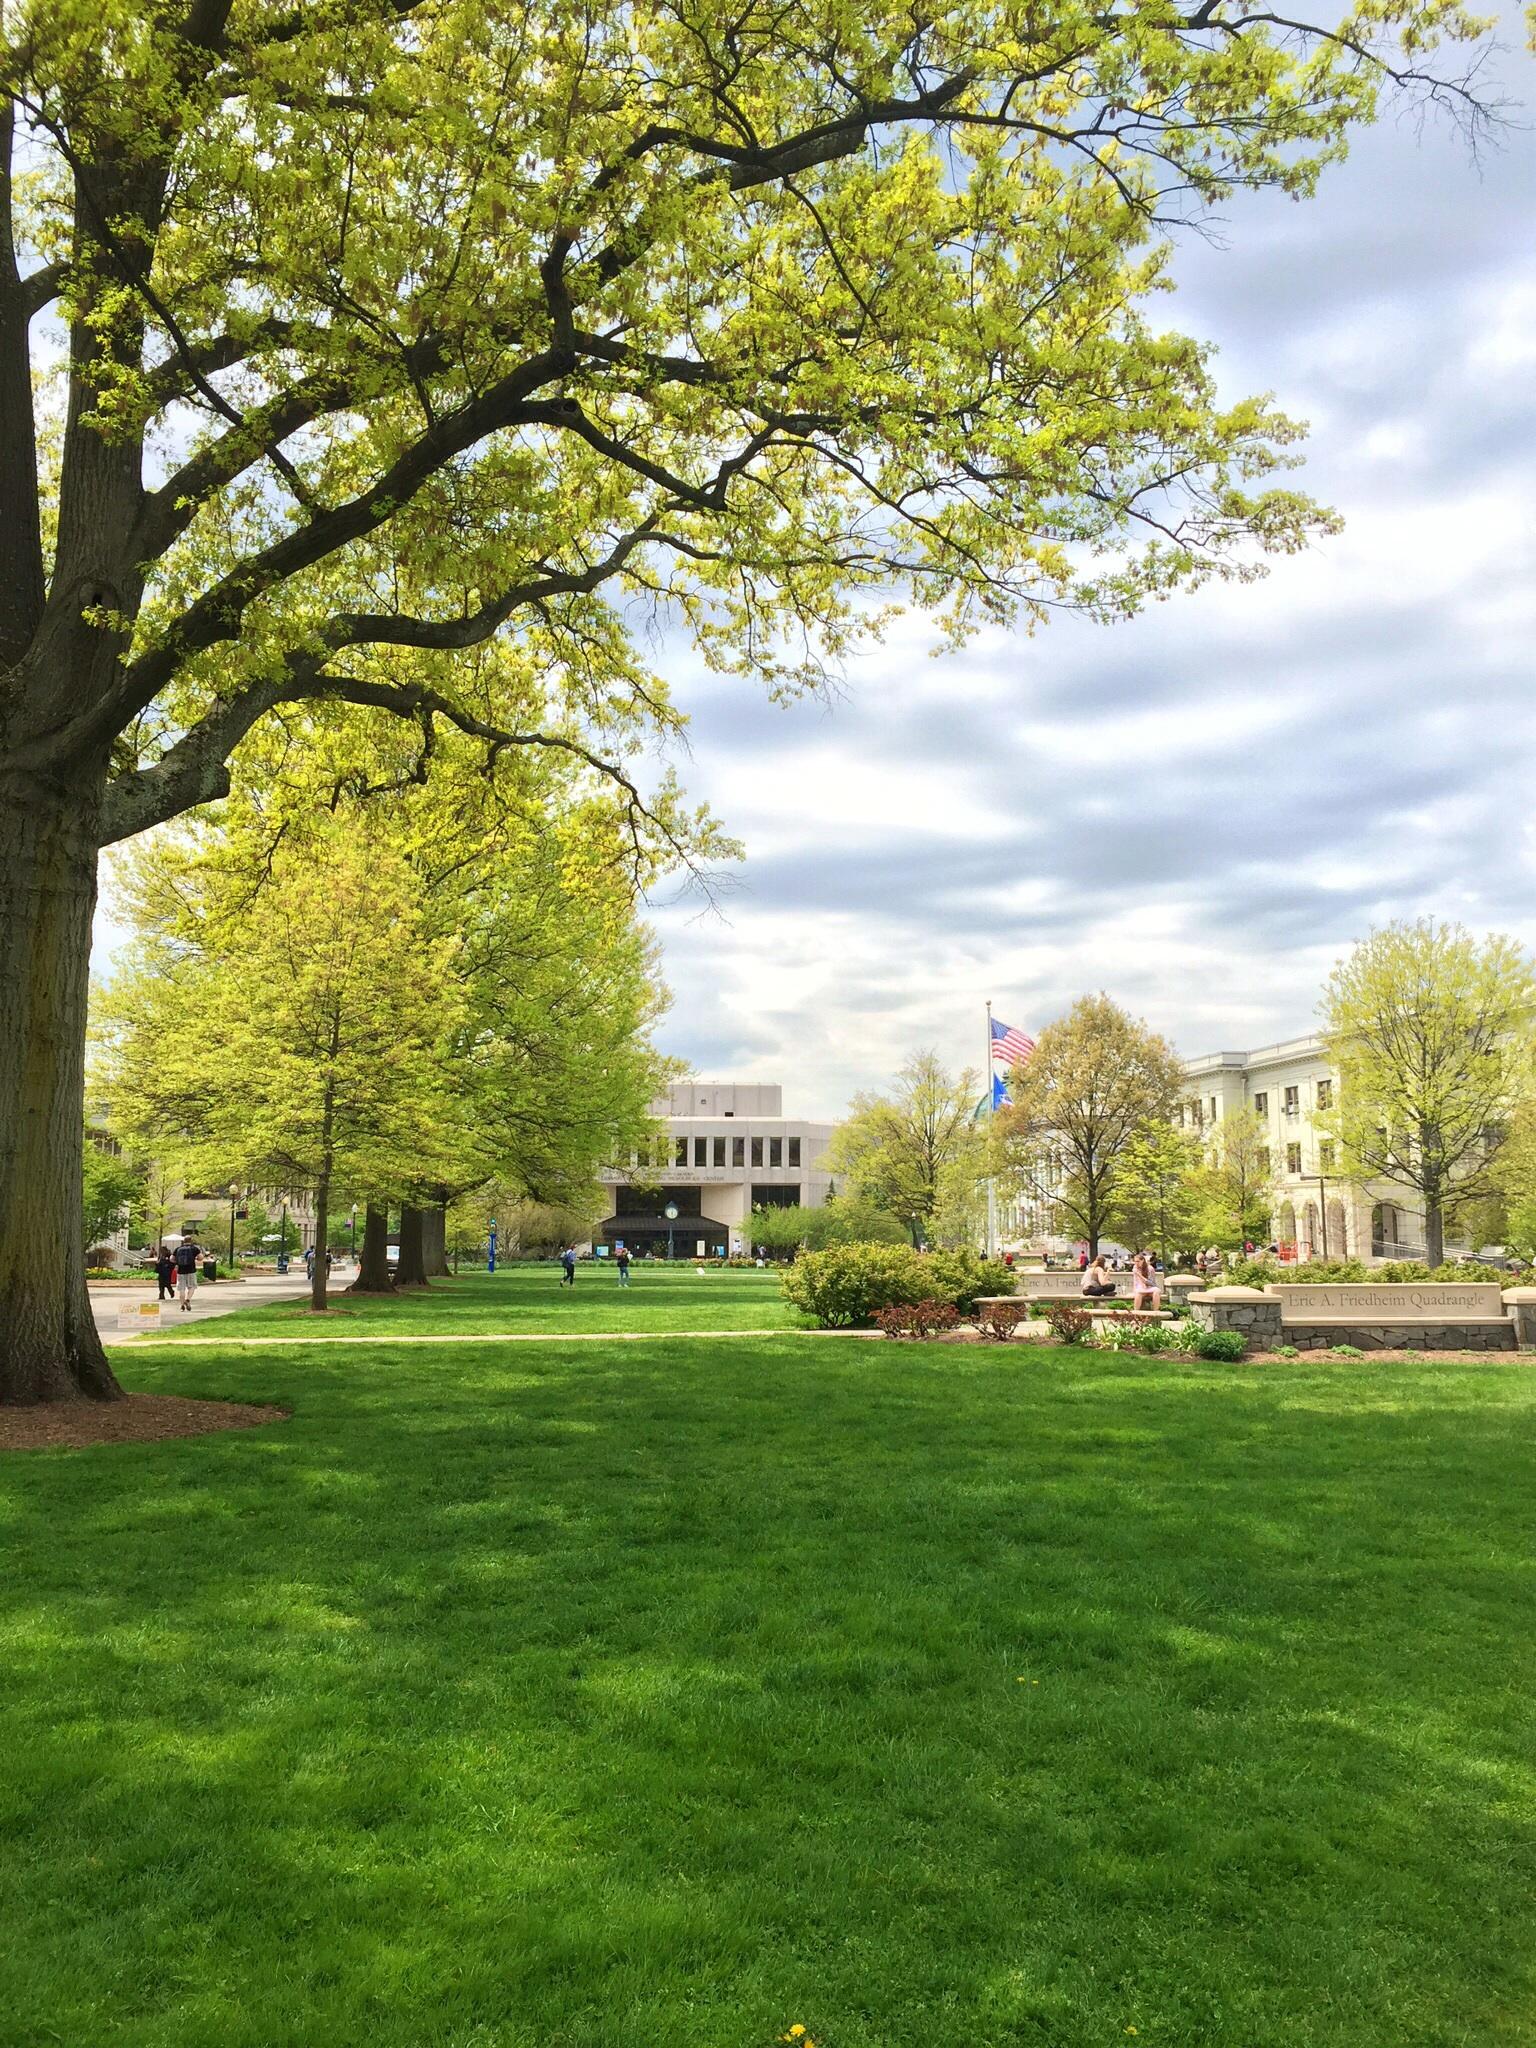 American University, Washington, D.C.